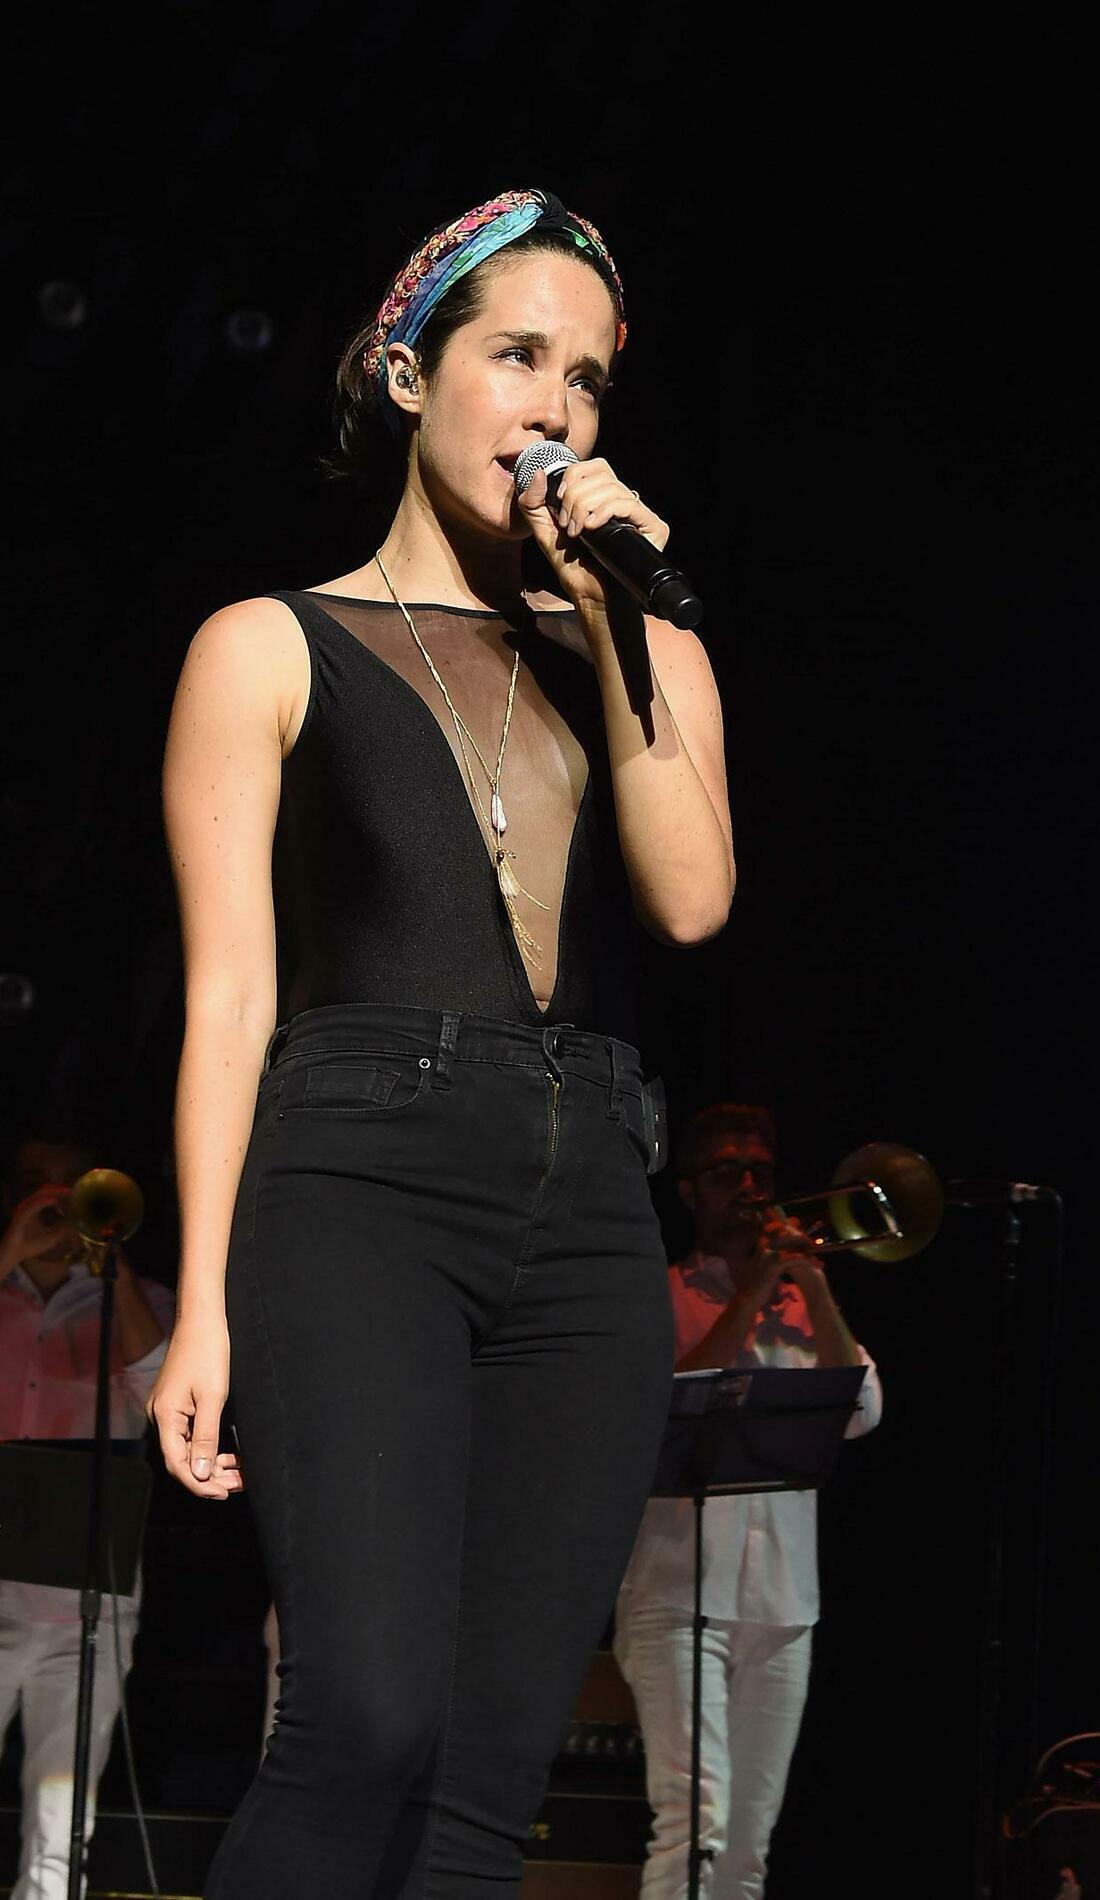 A Ximena Sarinana live event